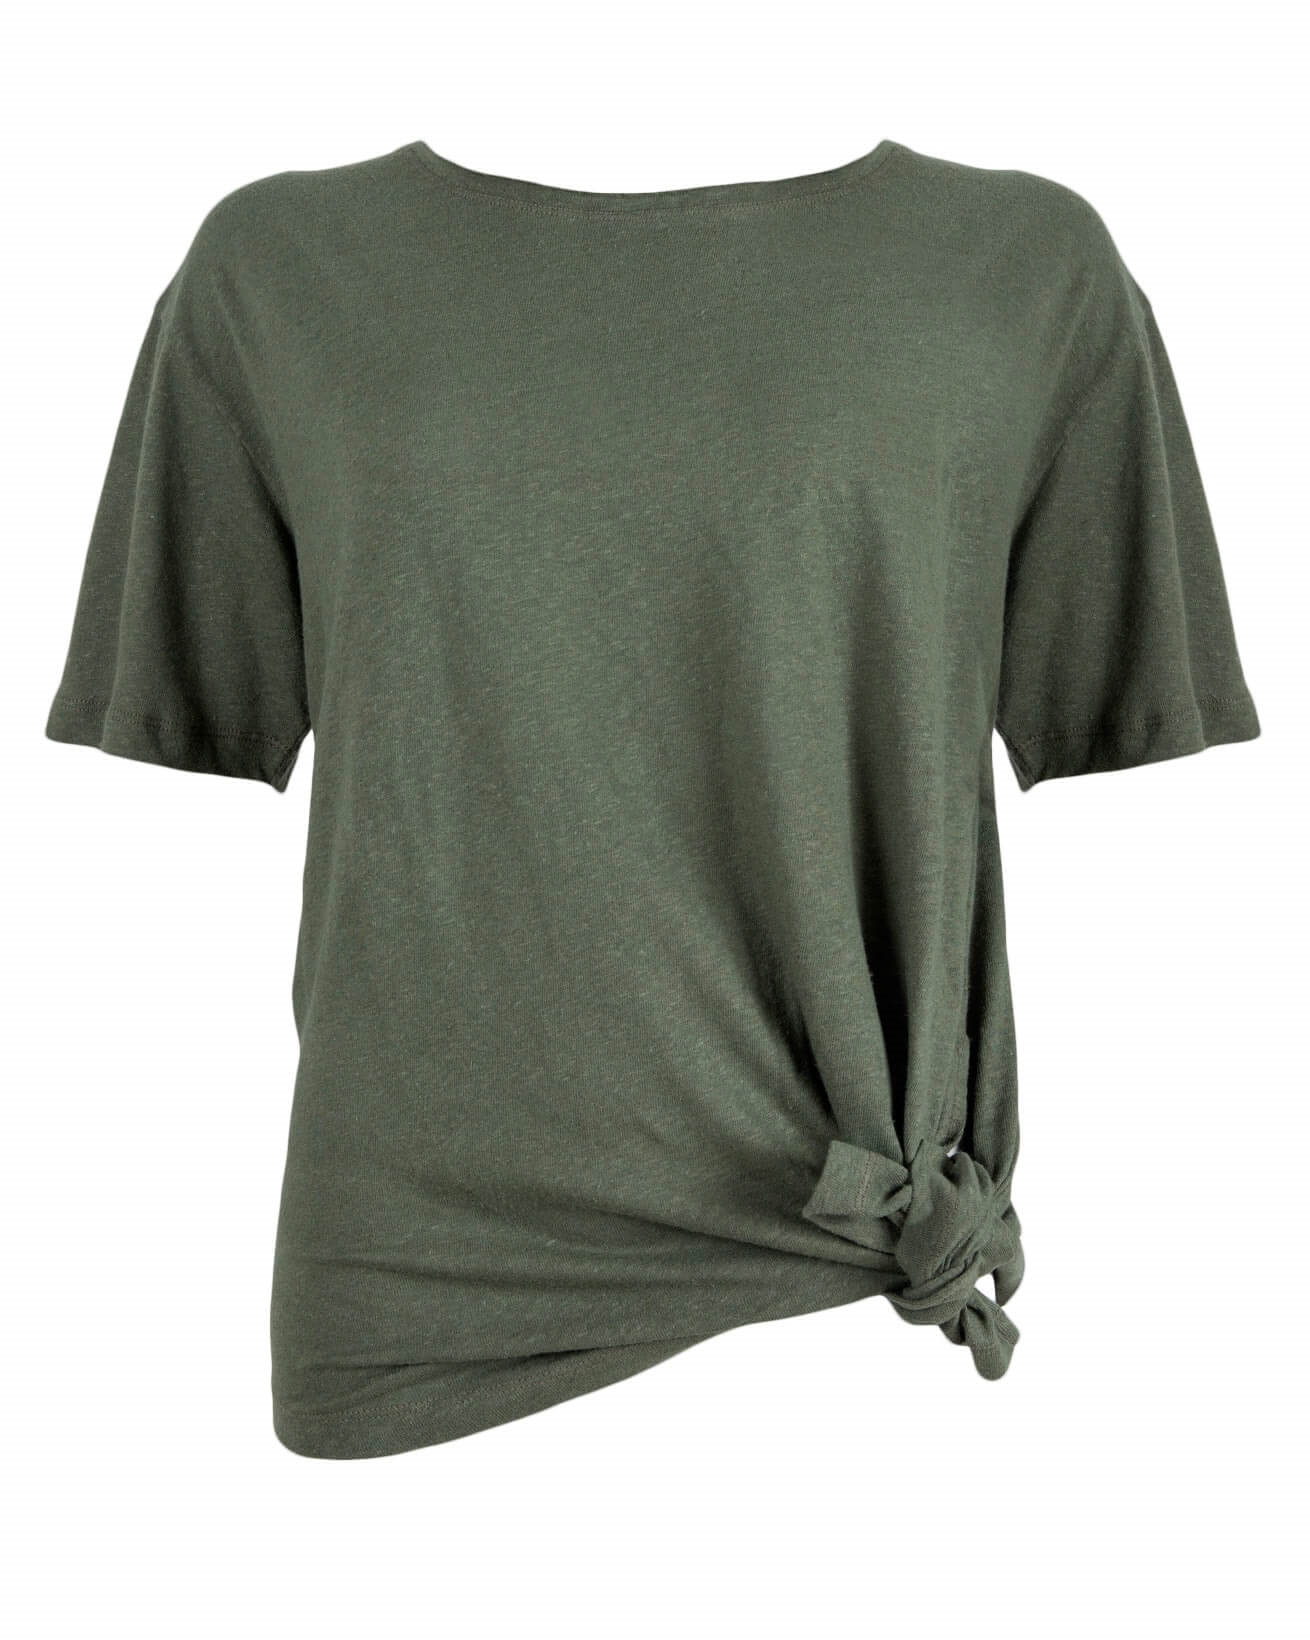 Linen Cotton Tie Waist Top - Size 12 - Khaki - 914